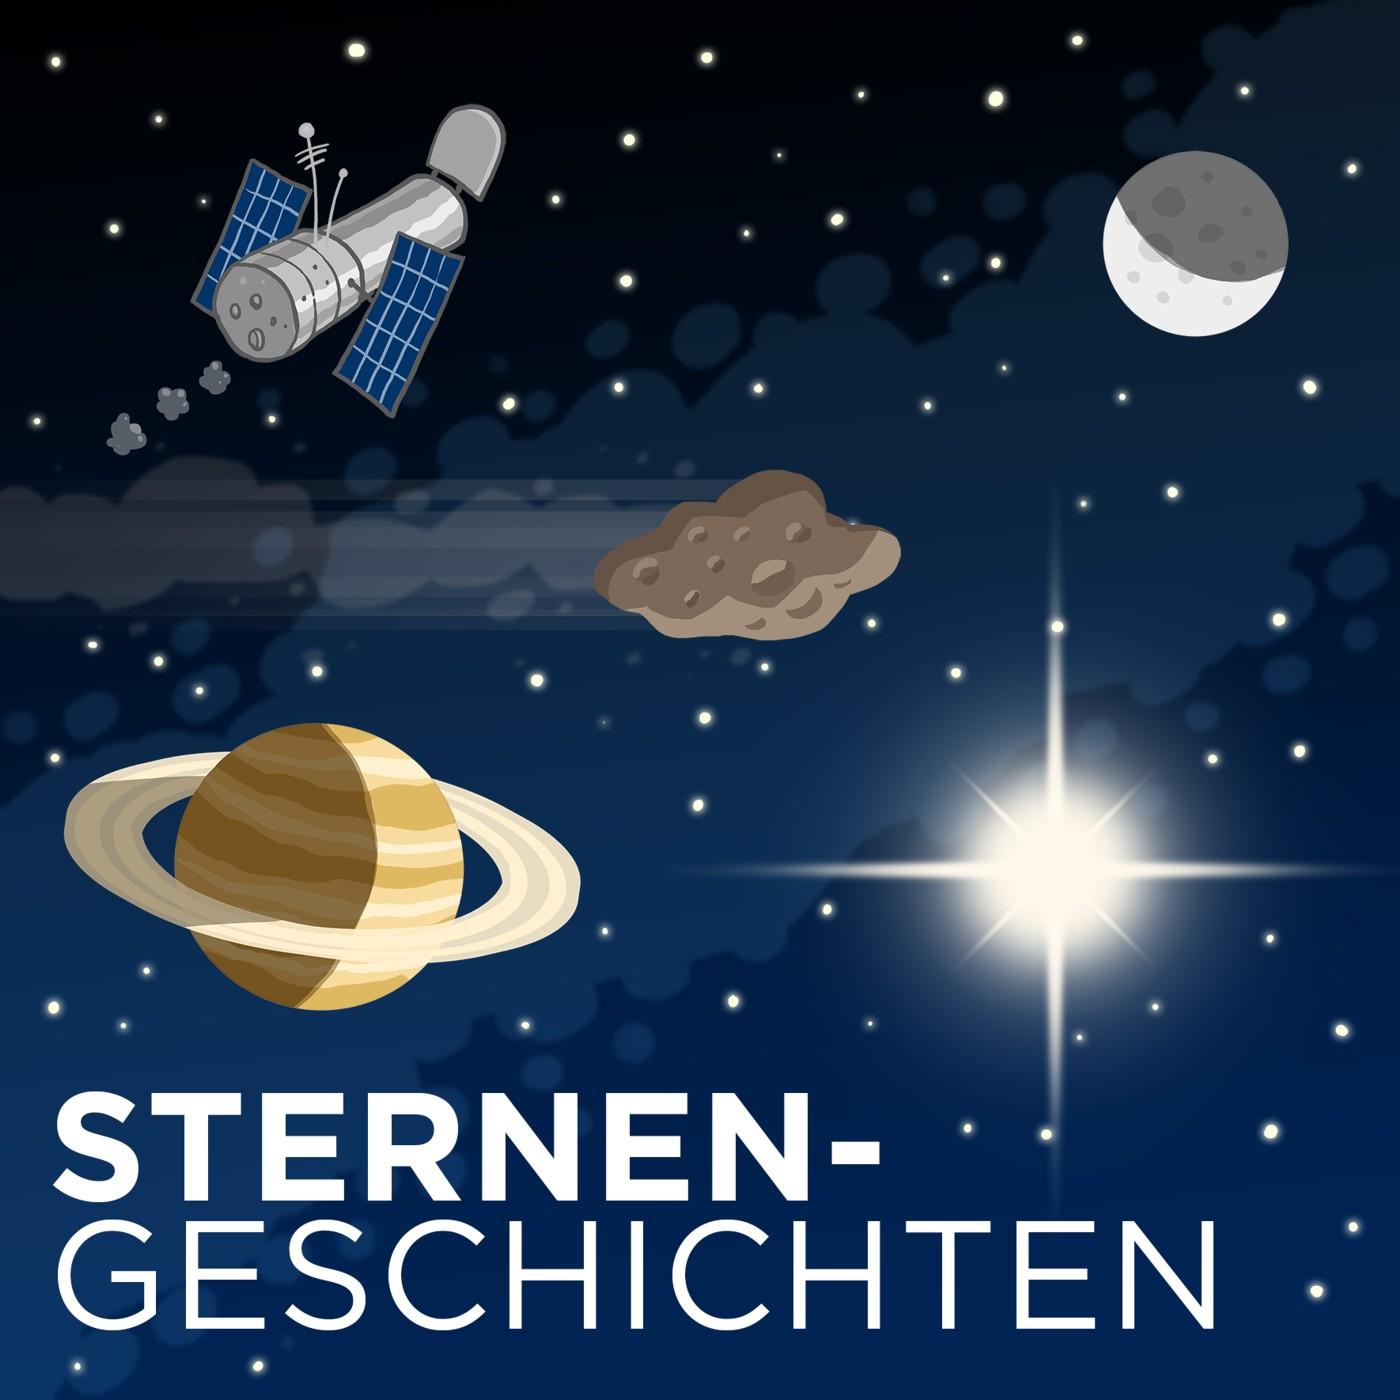 Sternengeschichten Folge 365: ITER, JET & Co: Wann kriegen wir die Kernfusion?